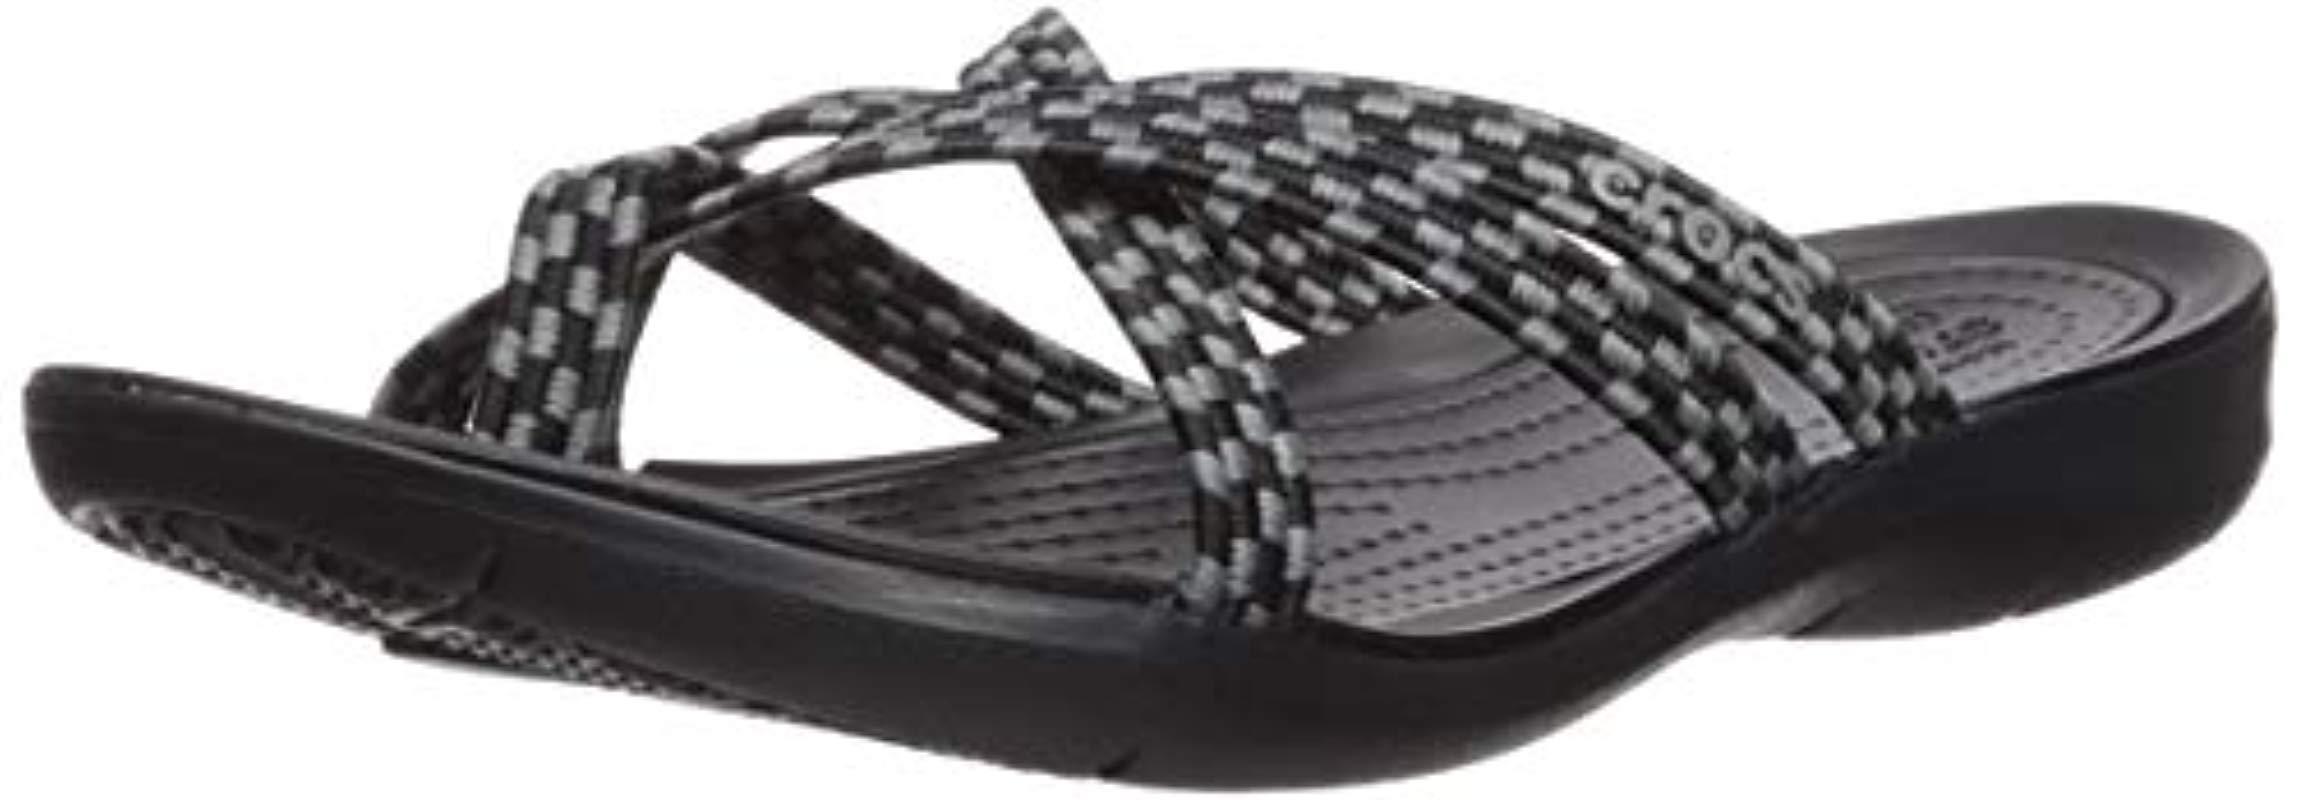 e696bb6c8 Lyst - Crocs™ Swiftwater Braided Web Flip Flop in Black